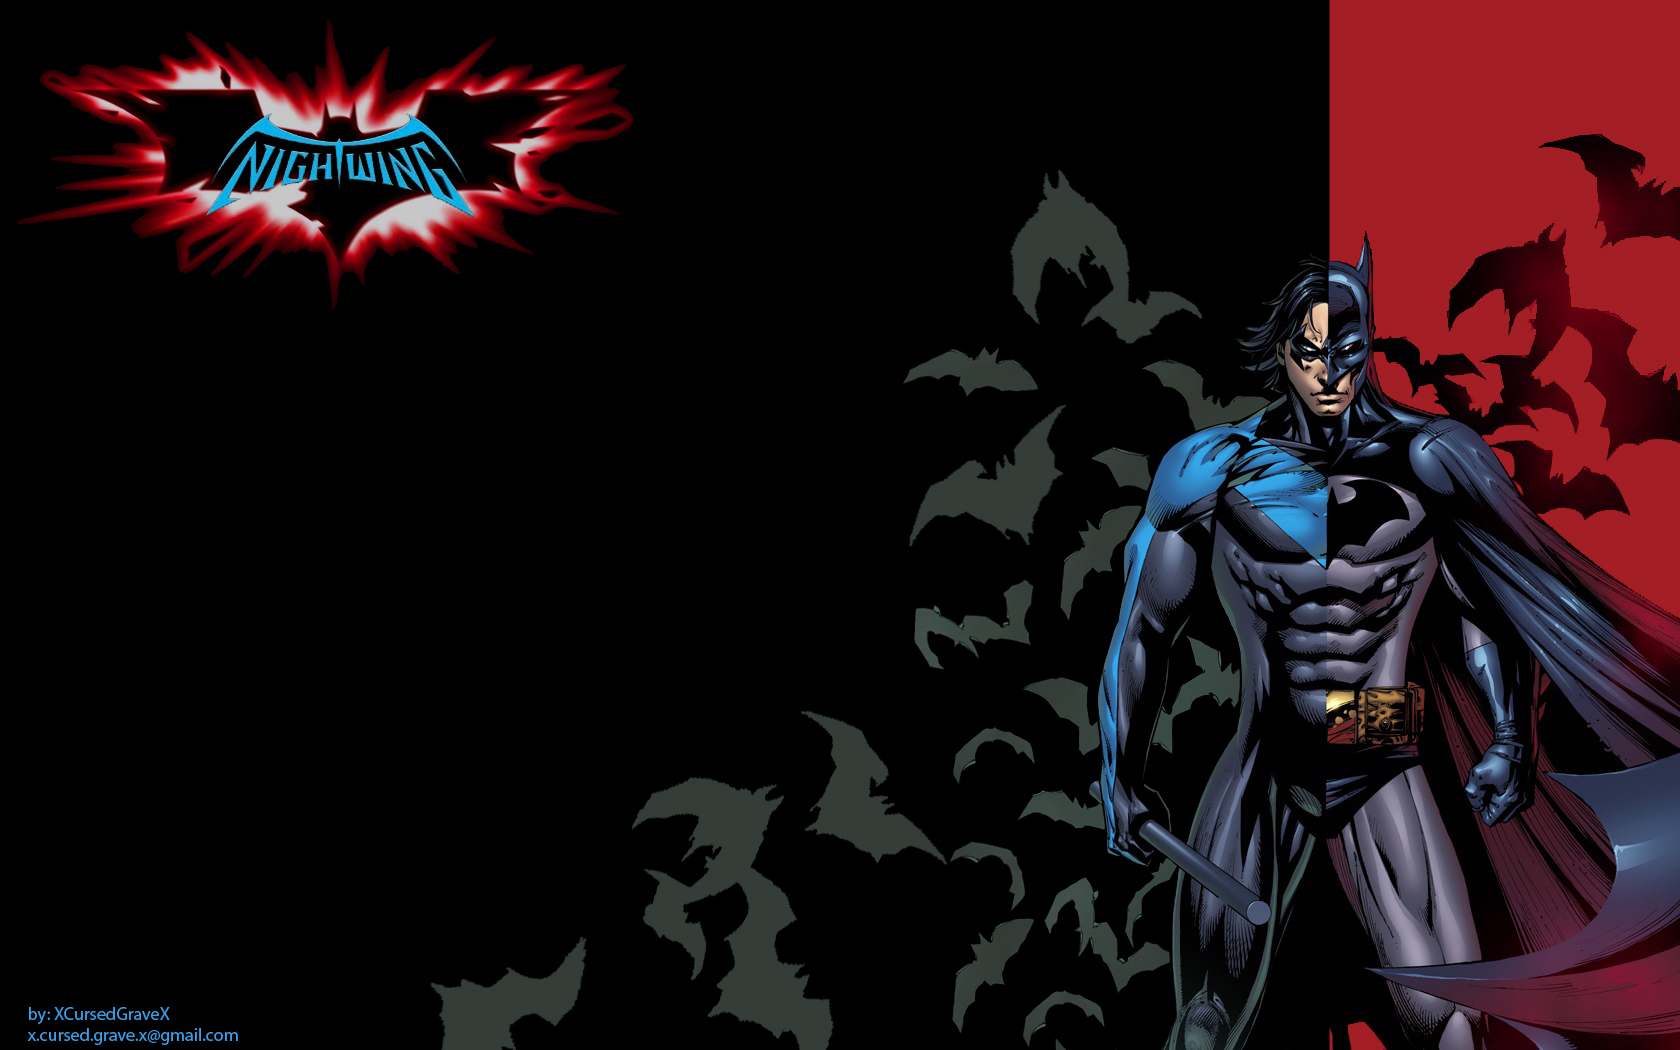 Nightwingsymbolwallpaper 1680x1050